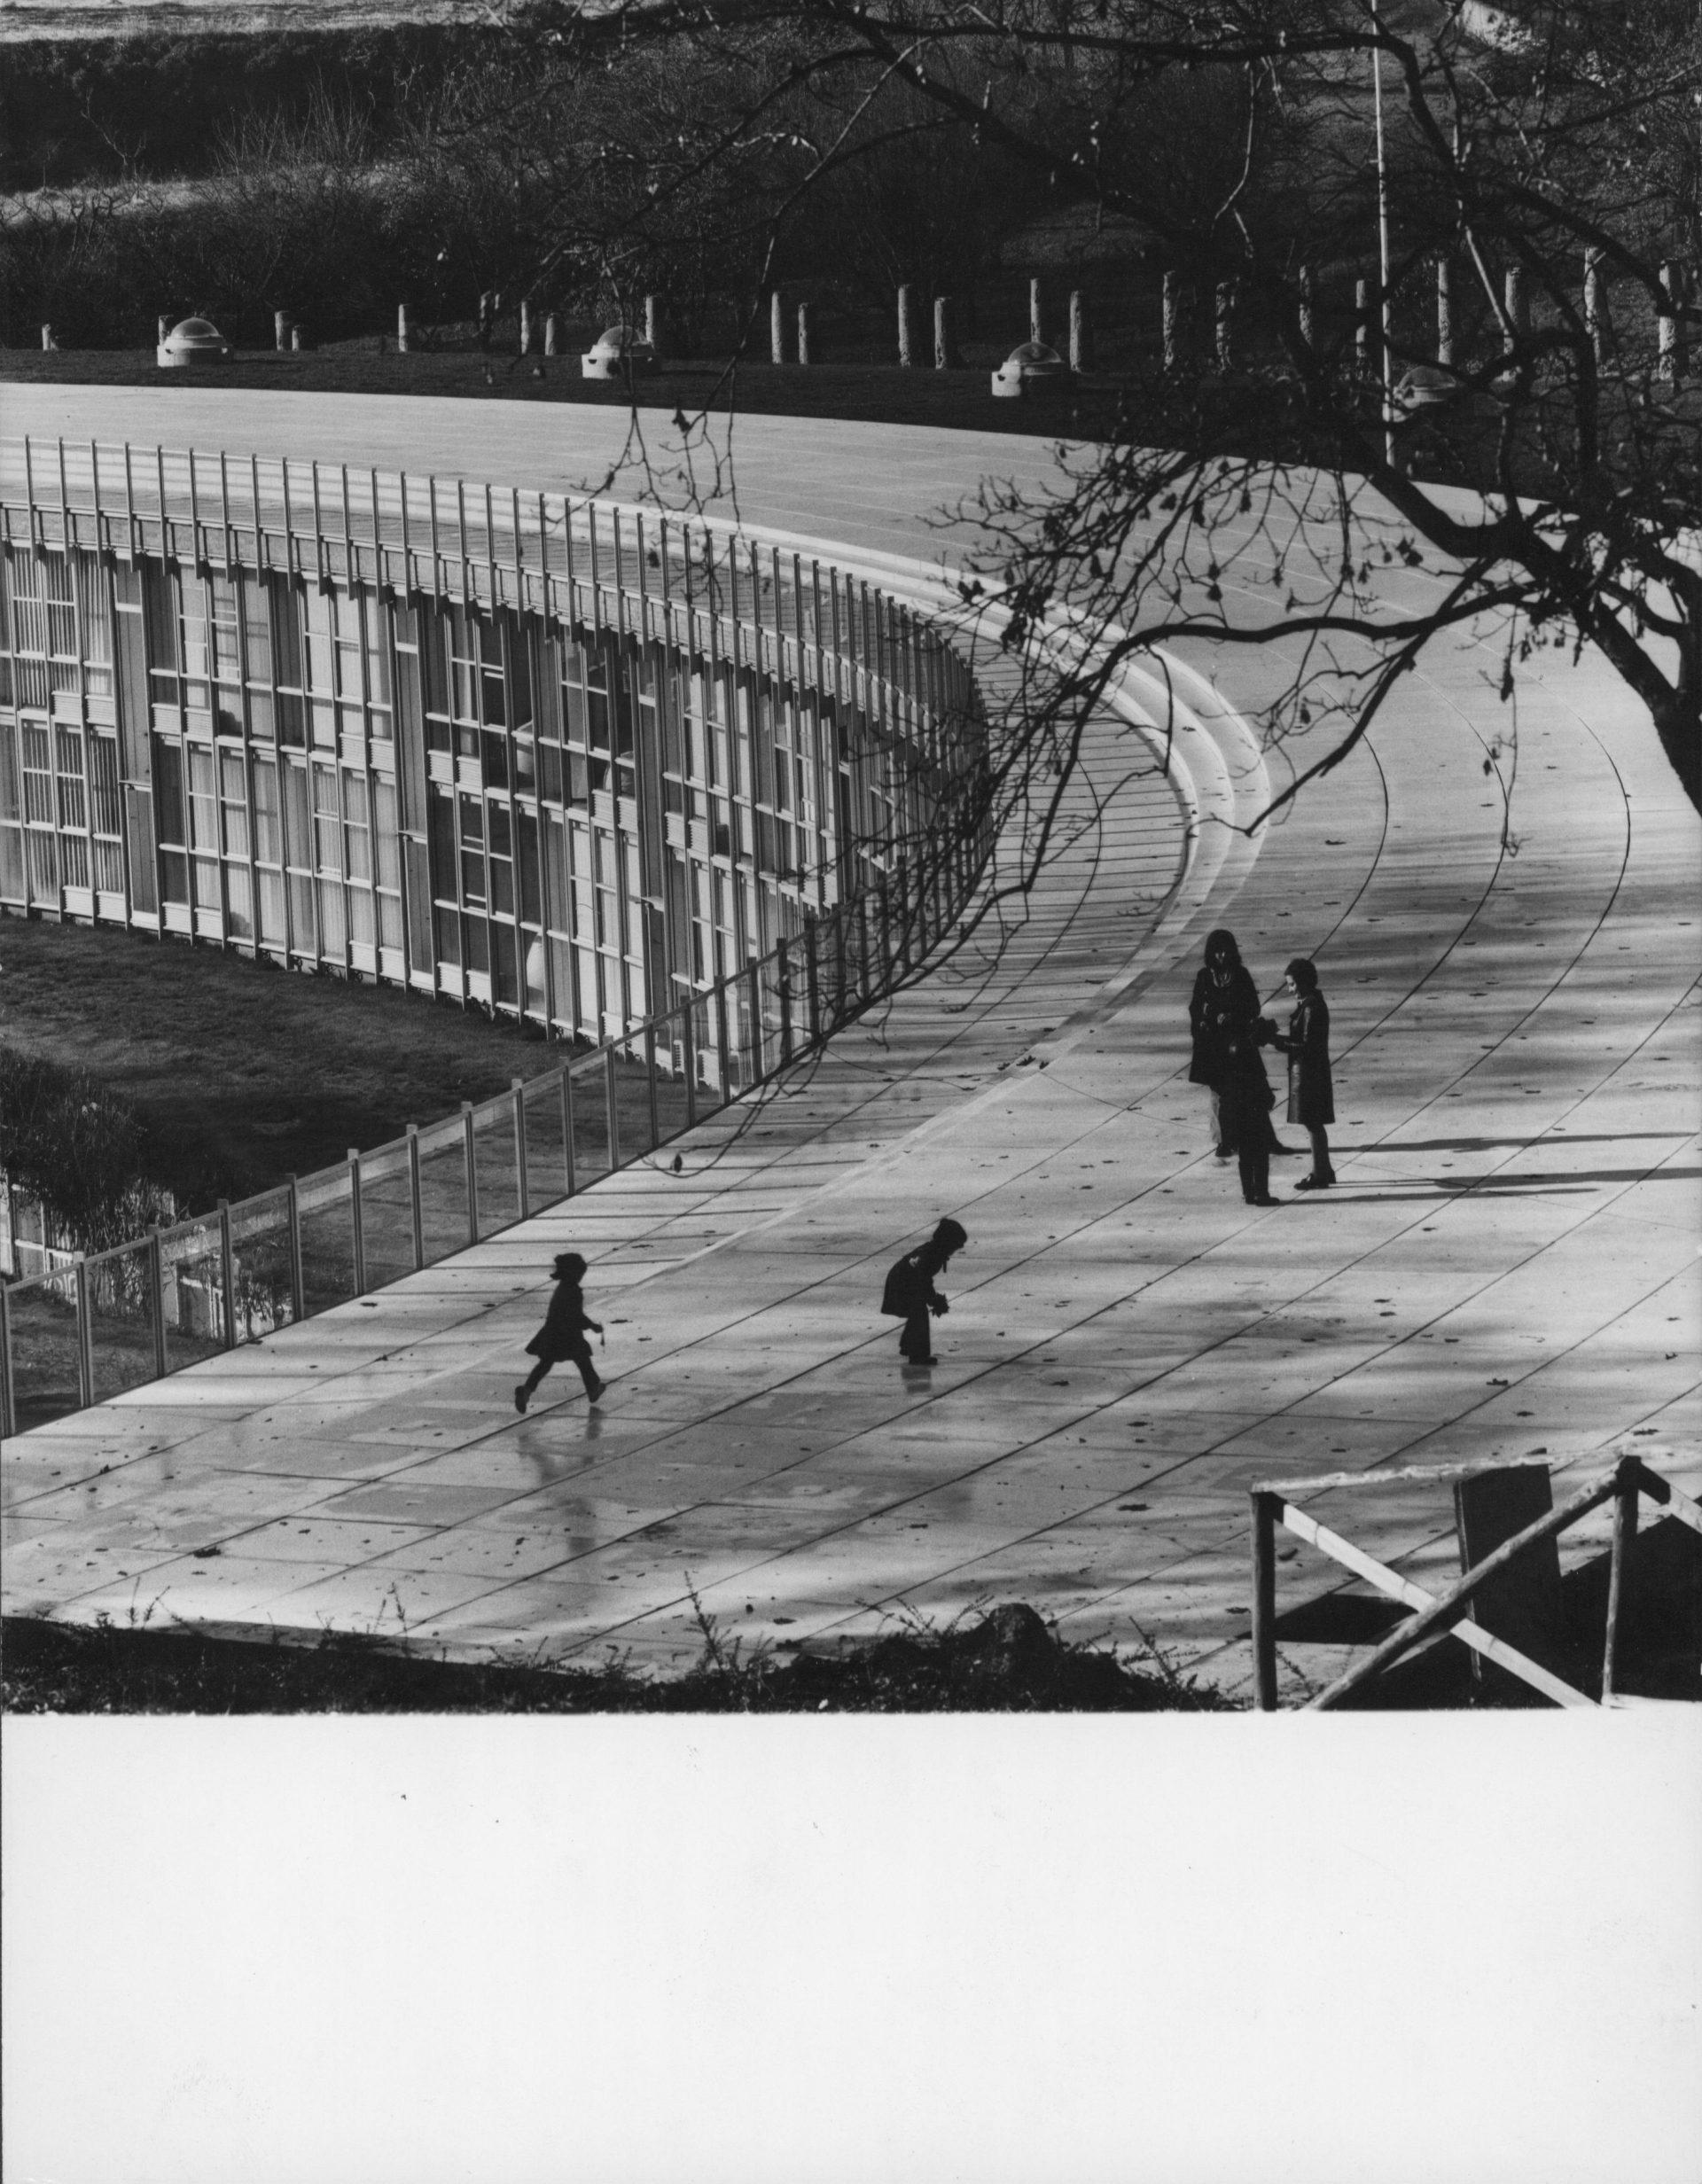 5_Berengo-Gardin-immagini-per-la-stampa-1920x2464